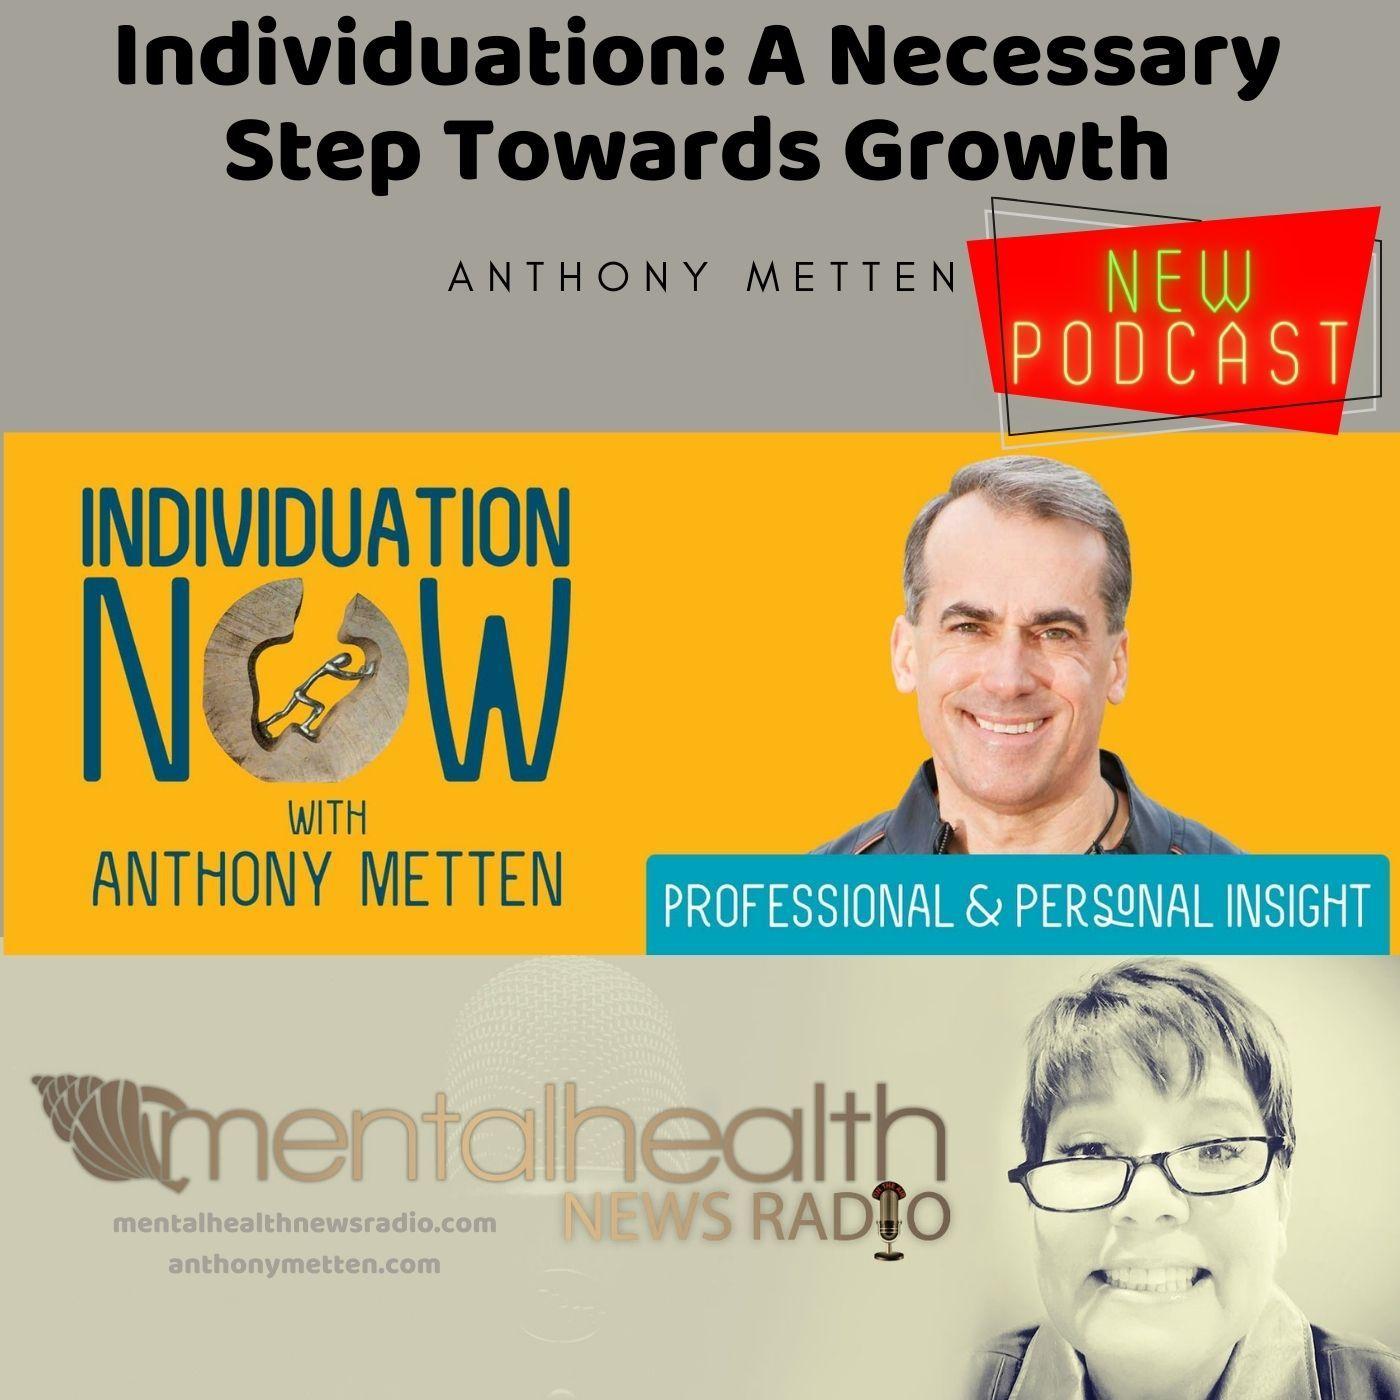 Mental Health News Radio - Individuation: A Necessary Step Towards Growth